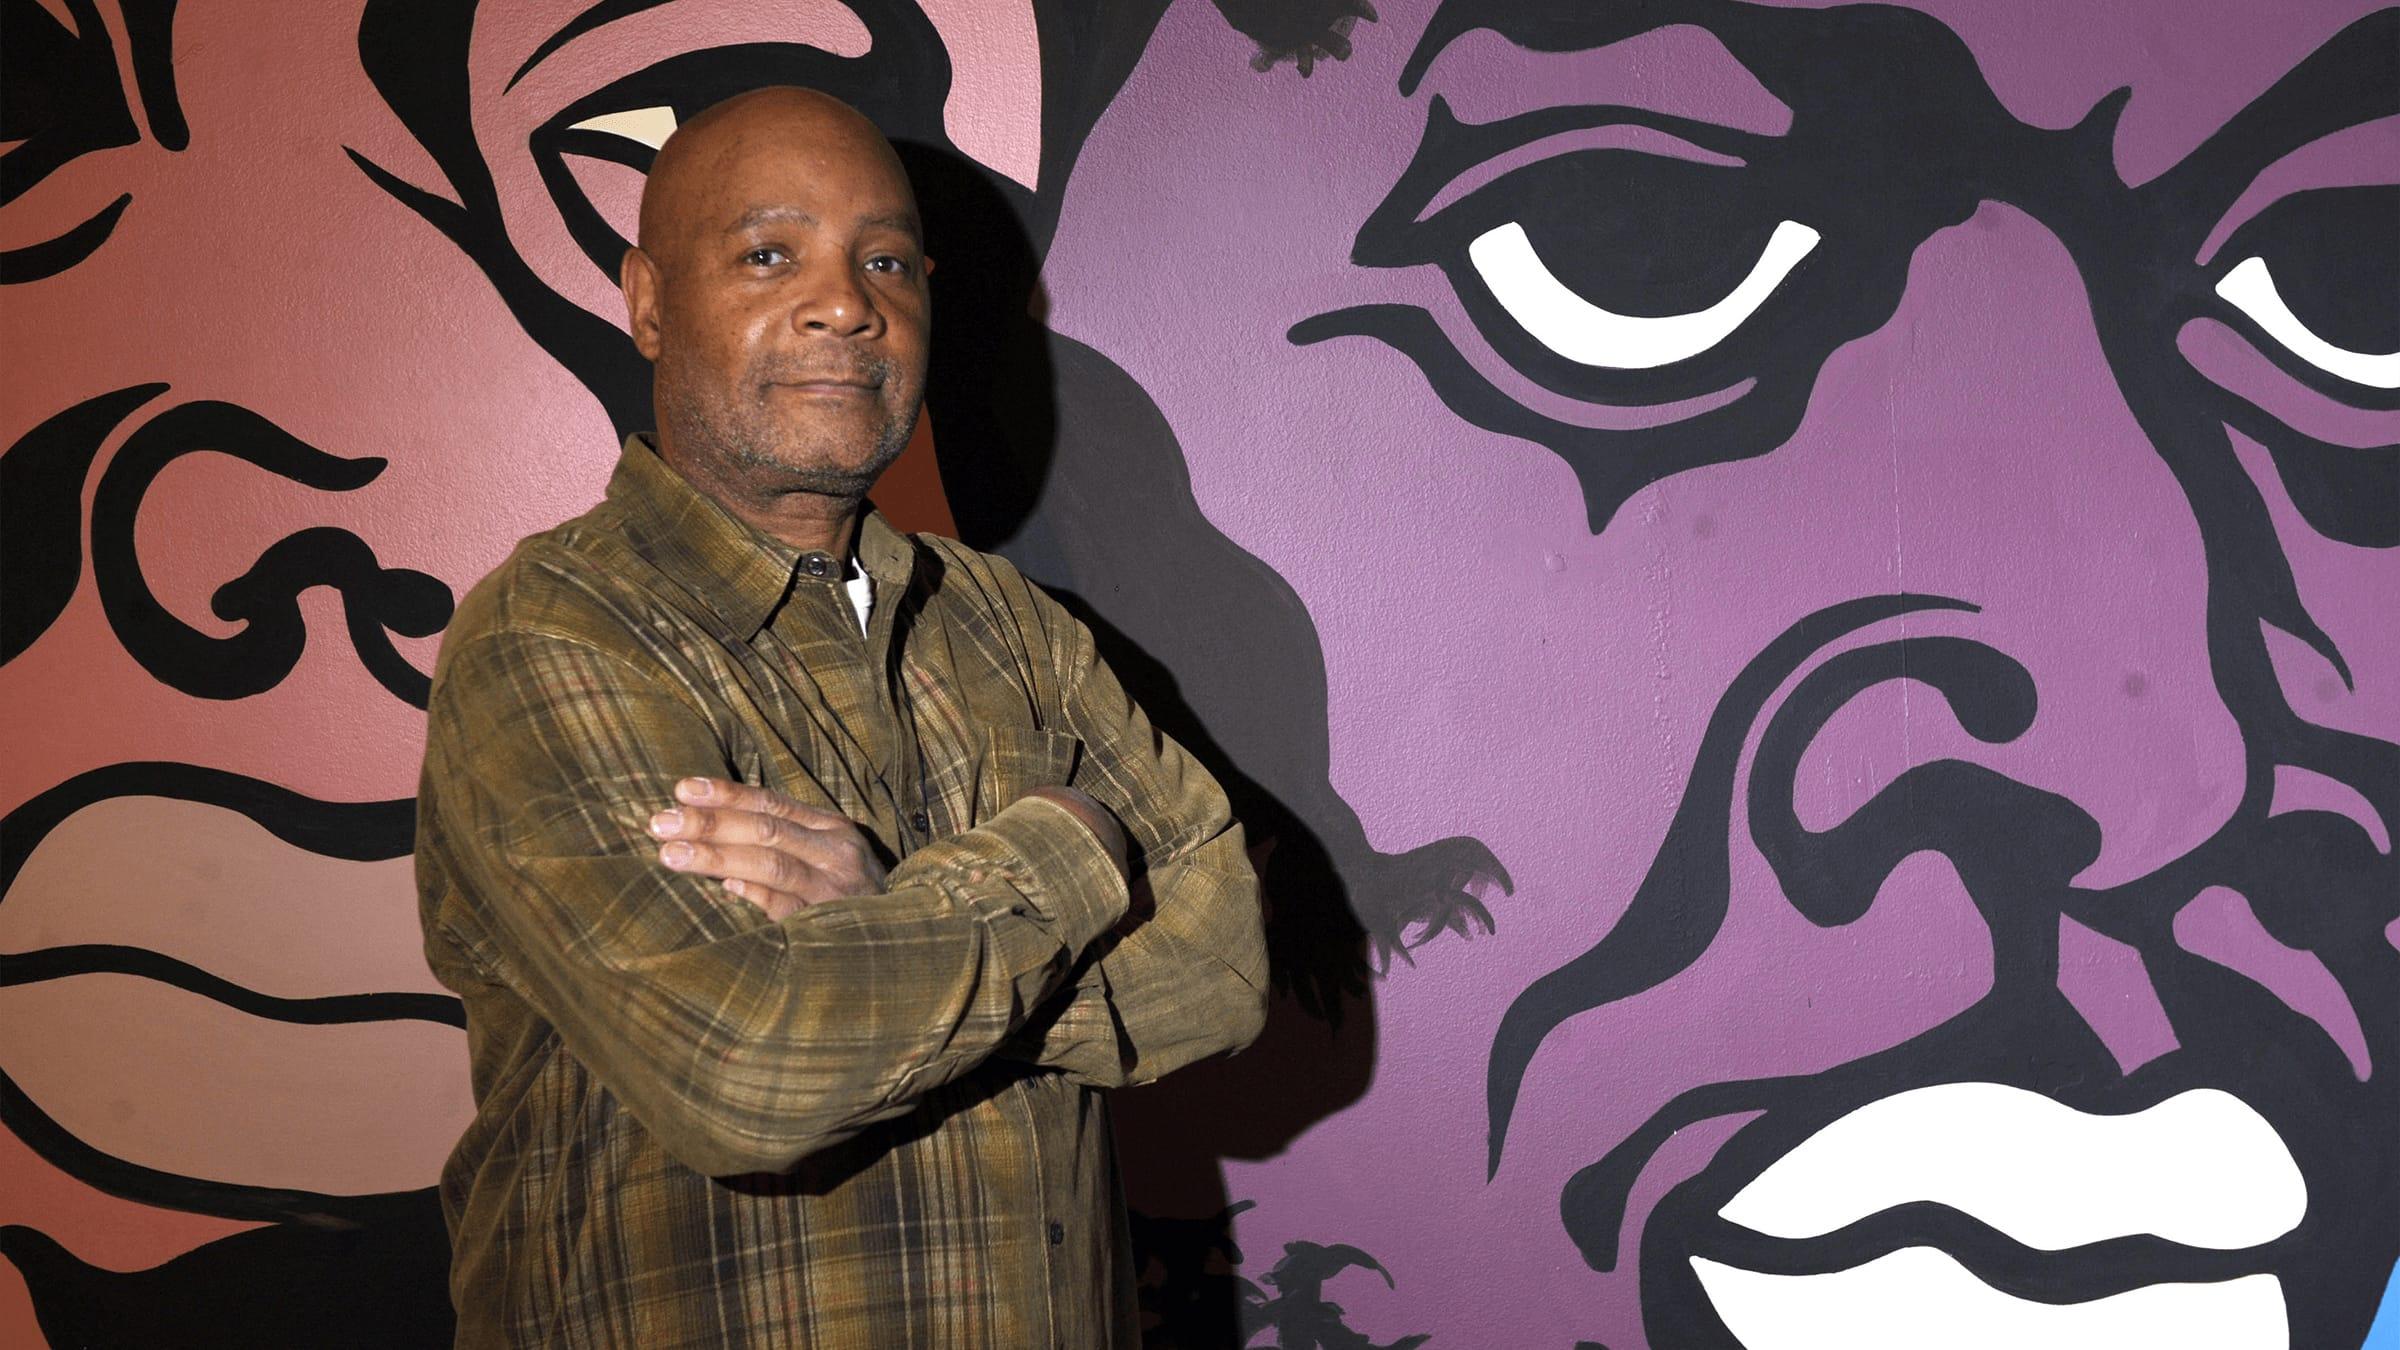 Revolutionary Artist: Emory Douglas on the Black Panthers and Melvin Van Peebles